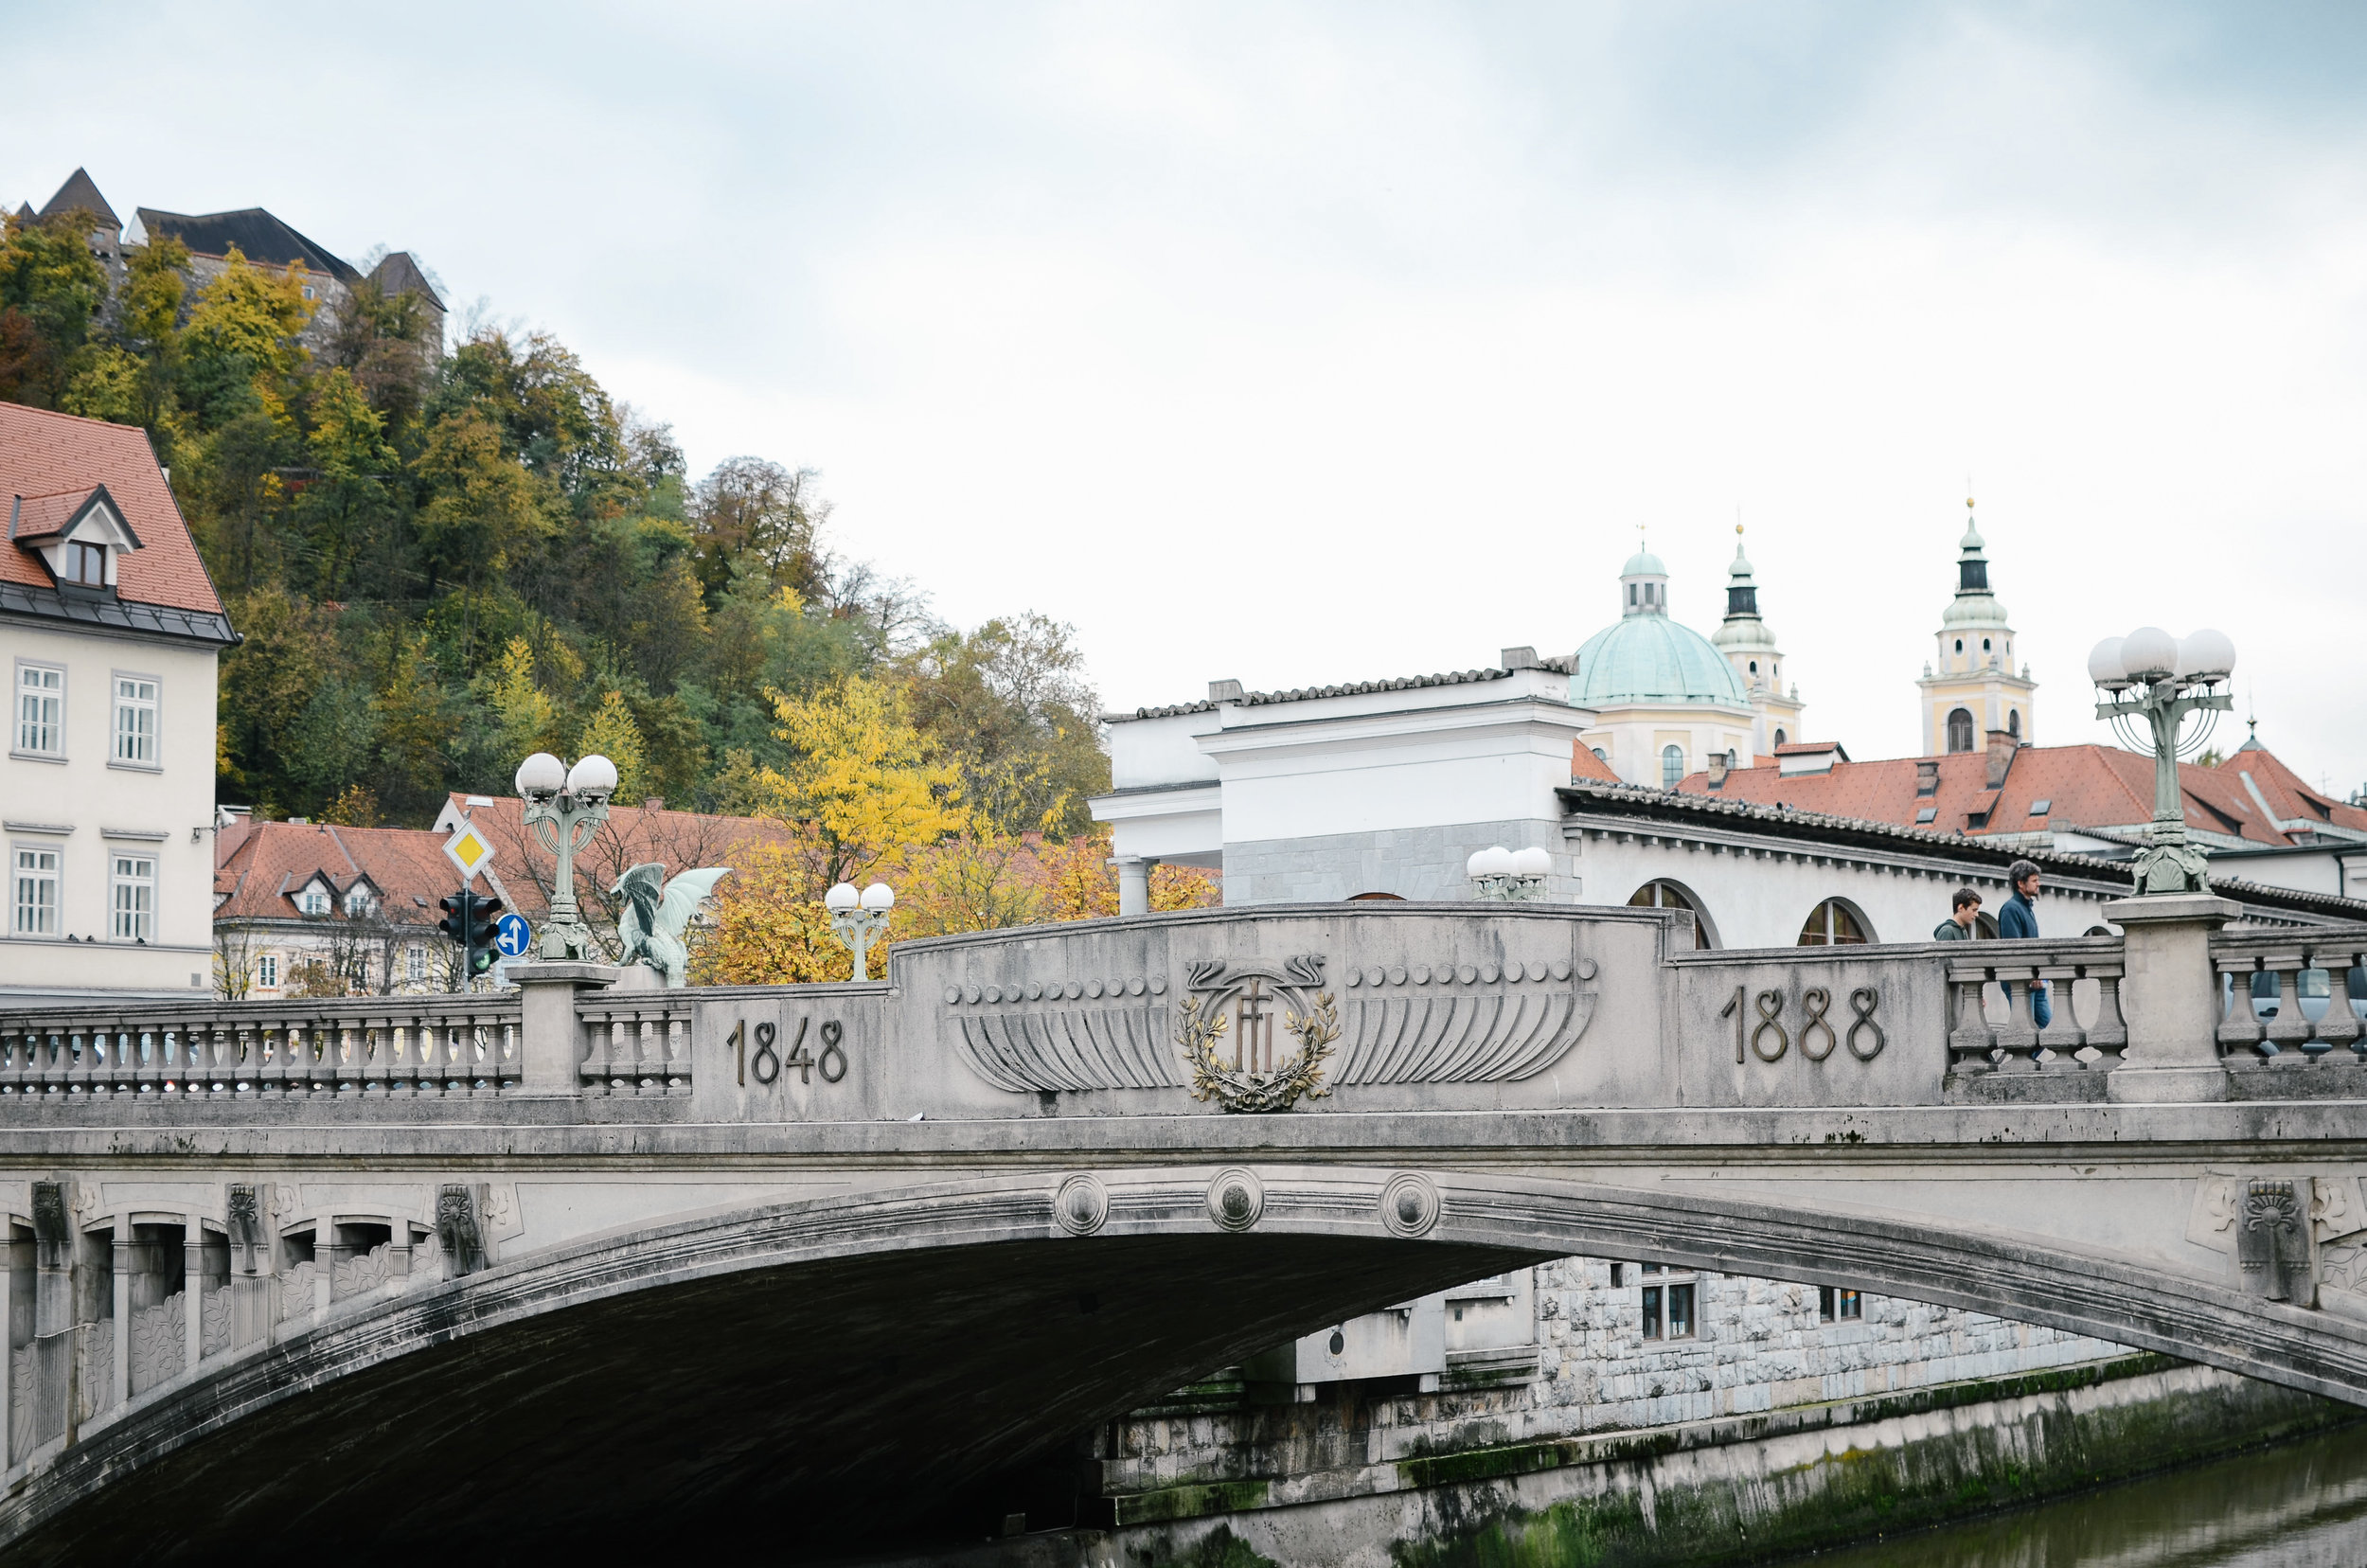 ljubljana-slovenia-travel-guide-lifeonpine_DSC_1822.jpg